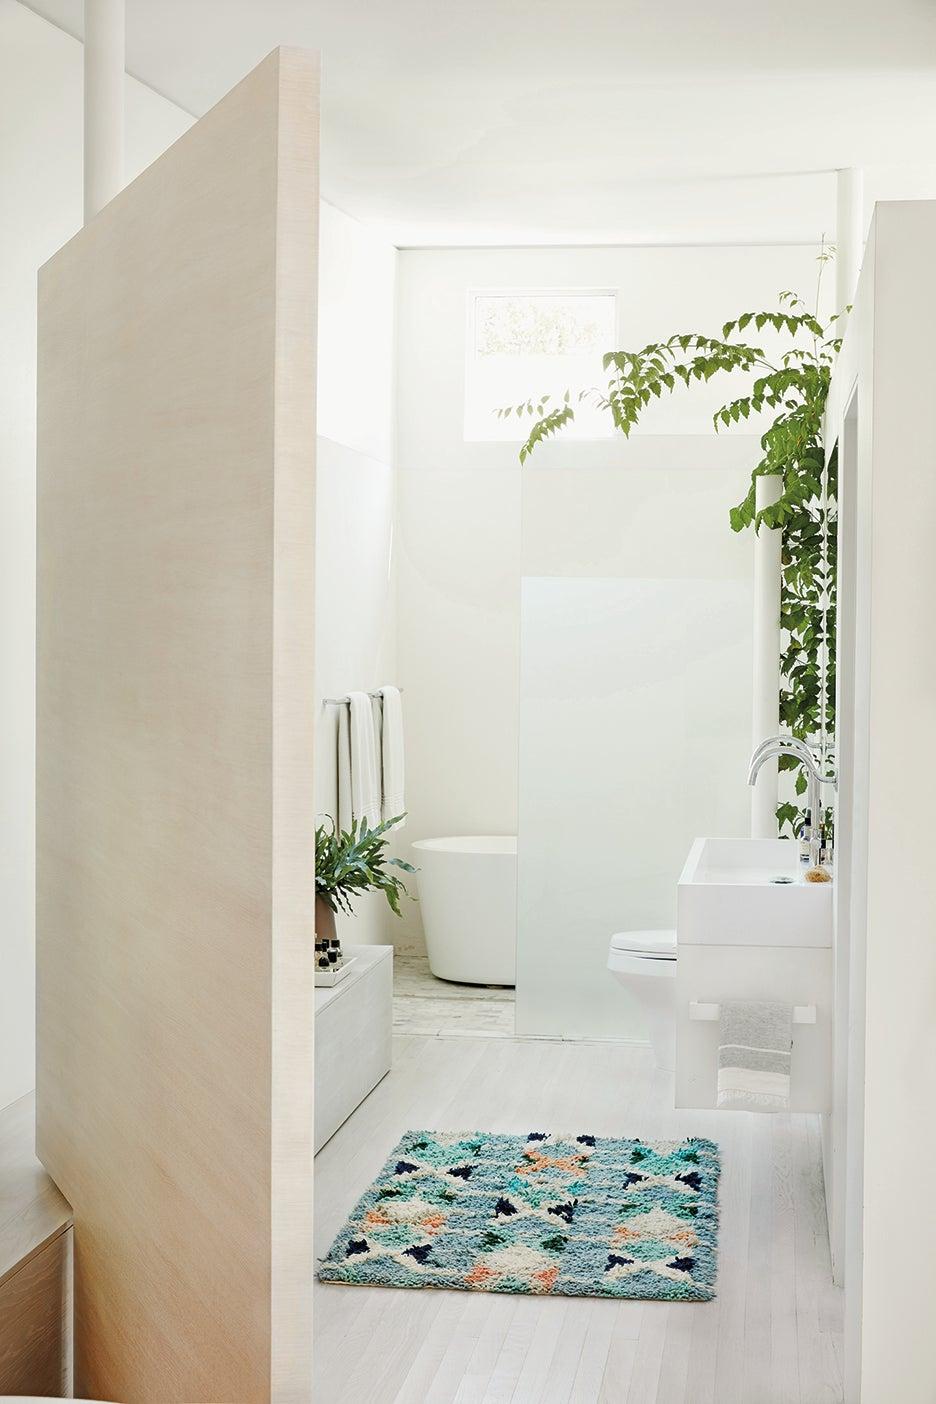 tyler's bathroom